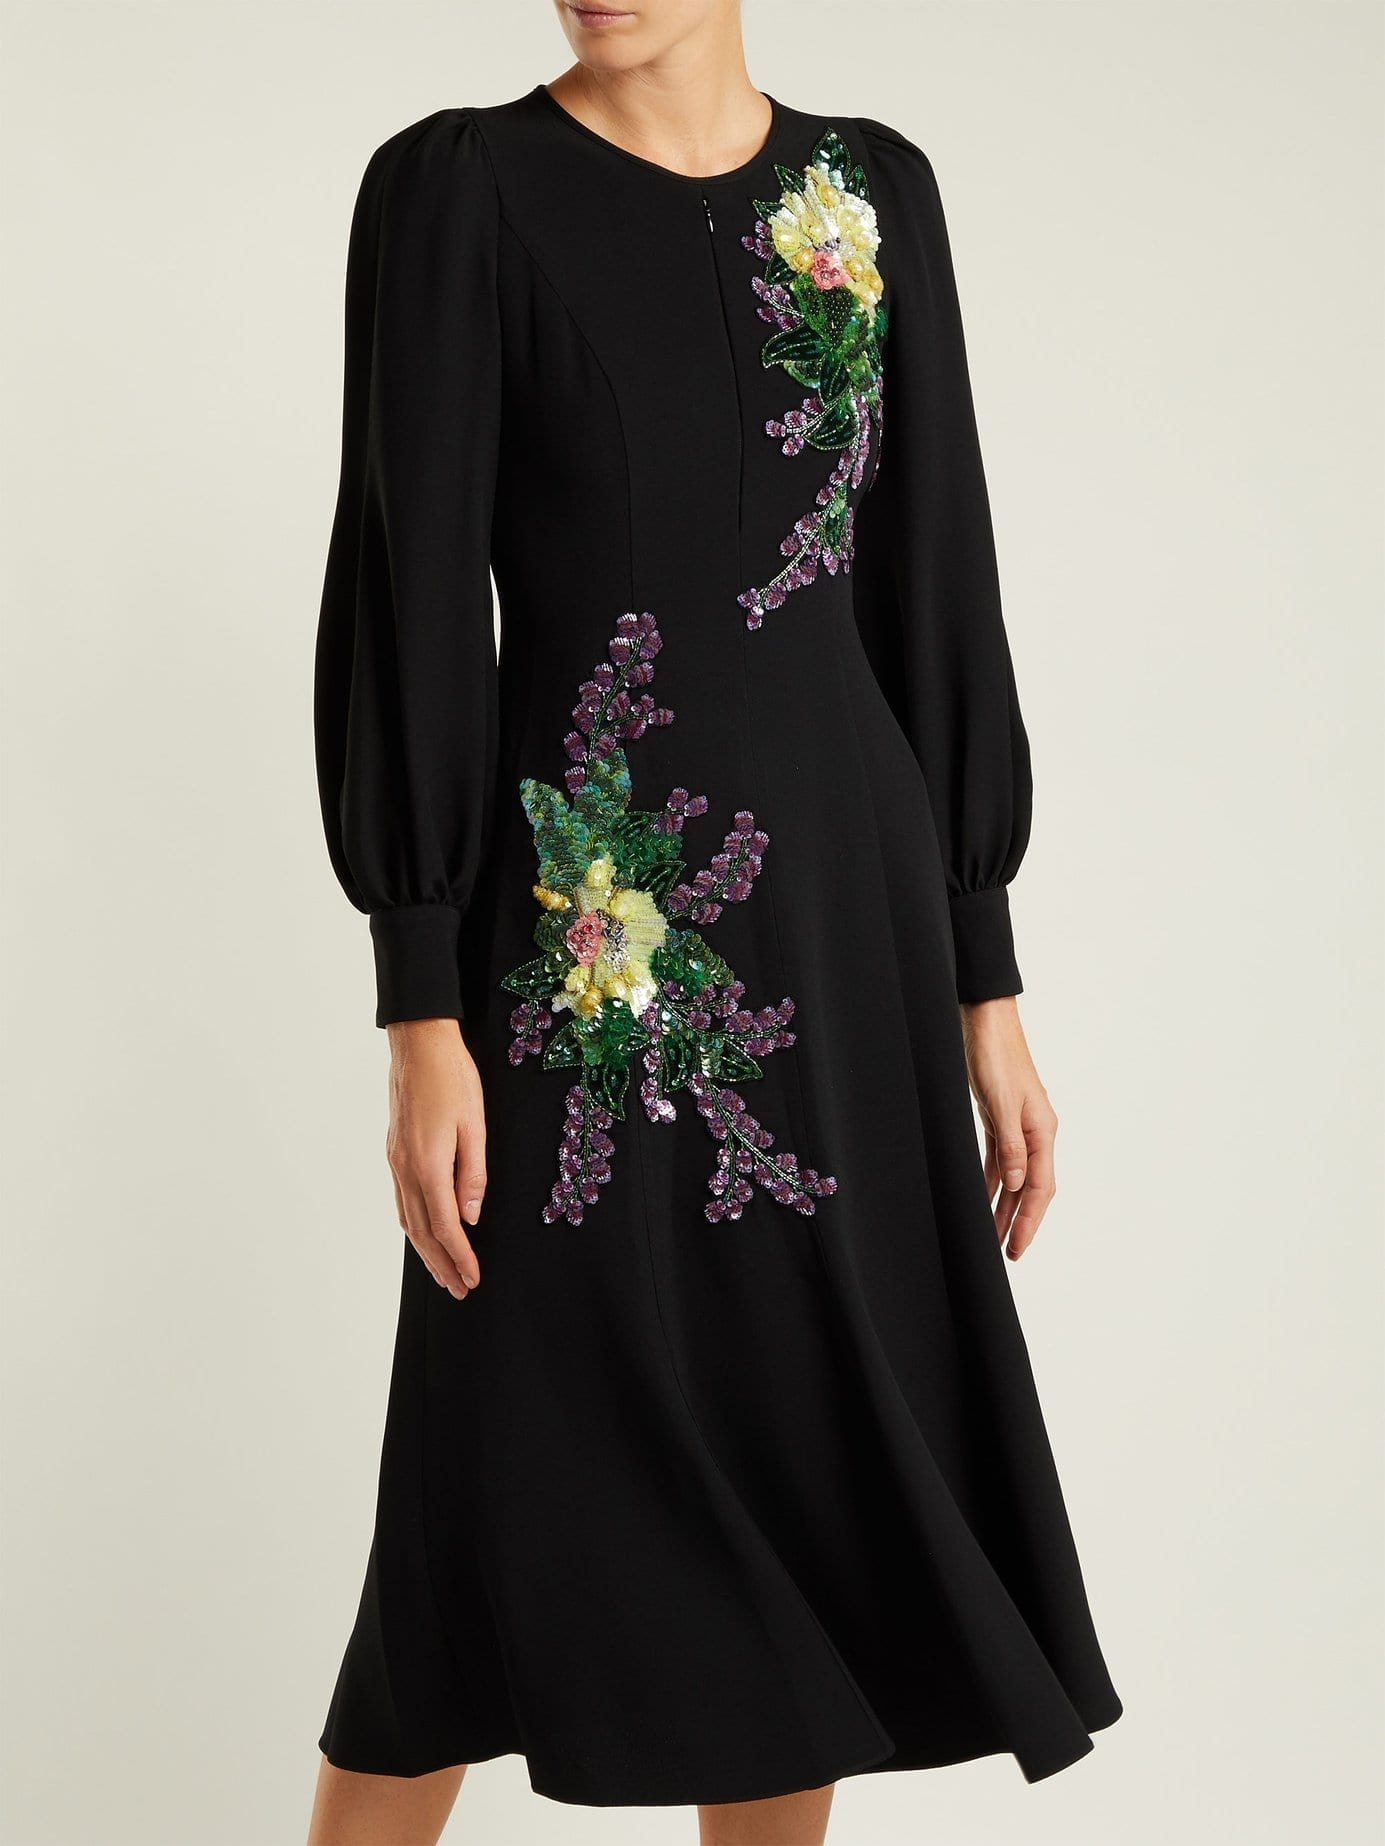 ANDREW GN Crystal And Sequin Embellished Crepe Black Dress